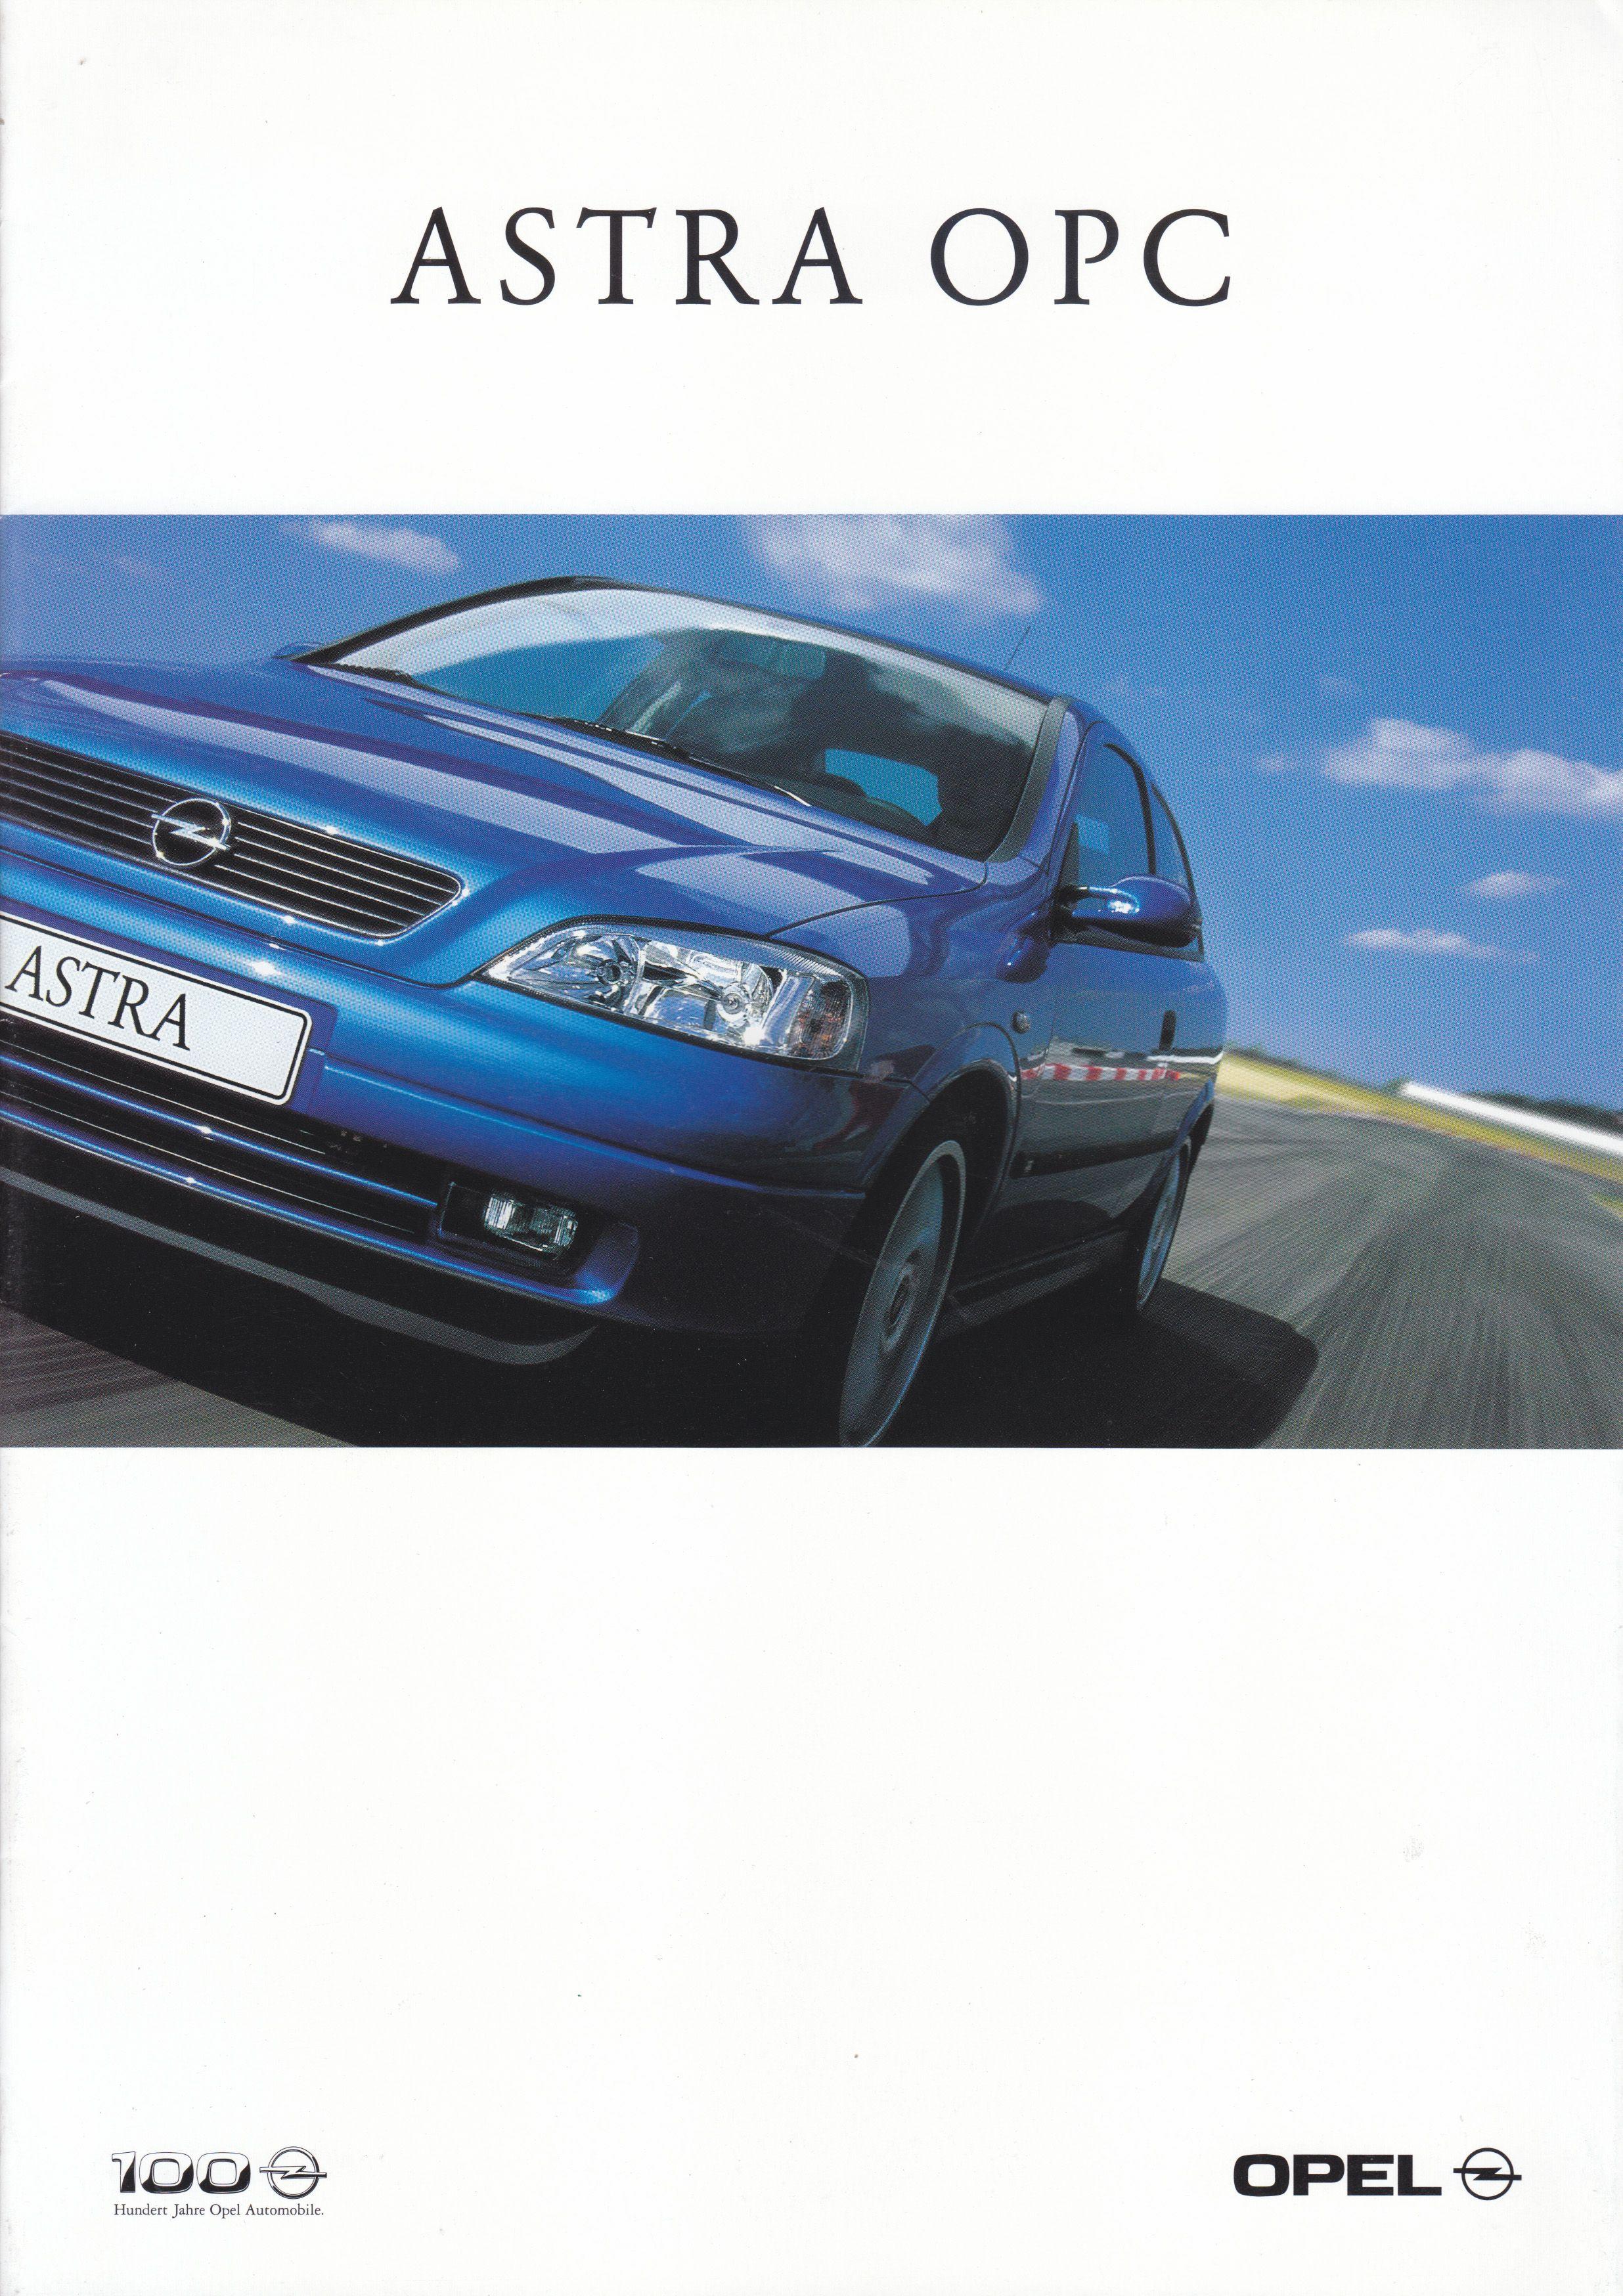 Opel Astra Opc 8 Page Brochure Specs Leaflet 01 1999 German